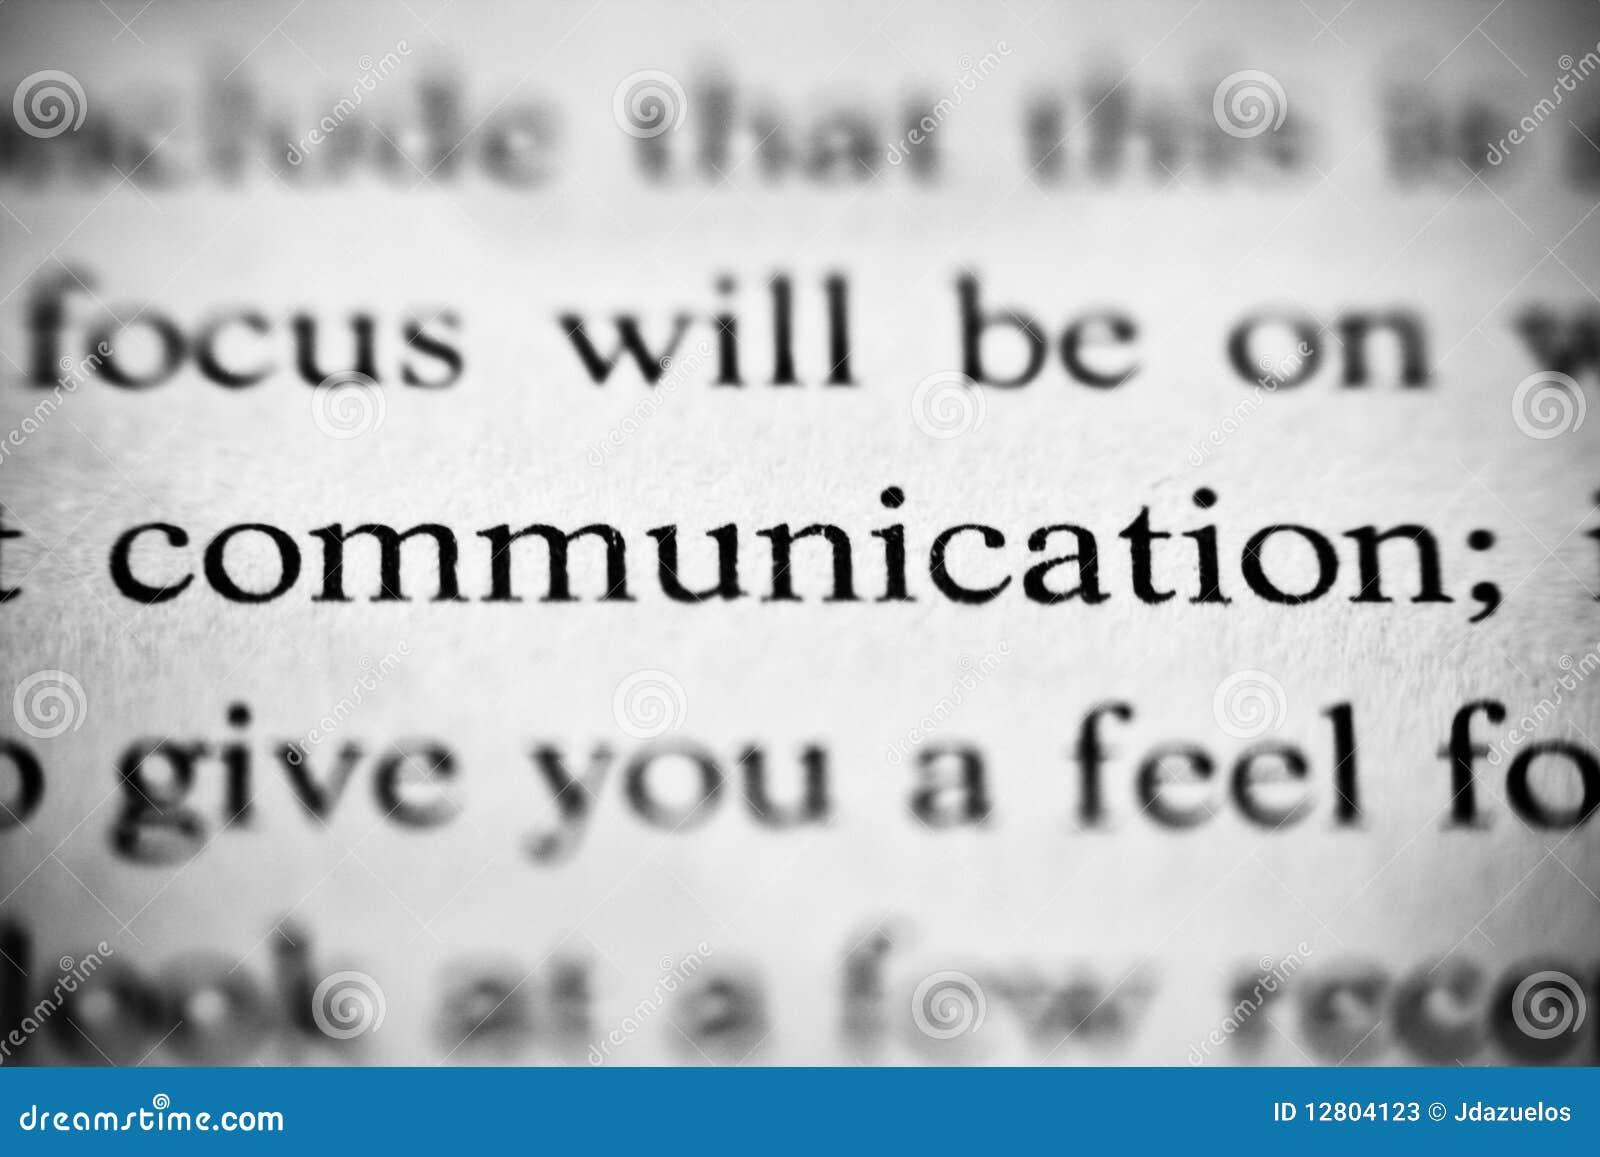 Fokus auf Kommunikation